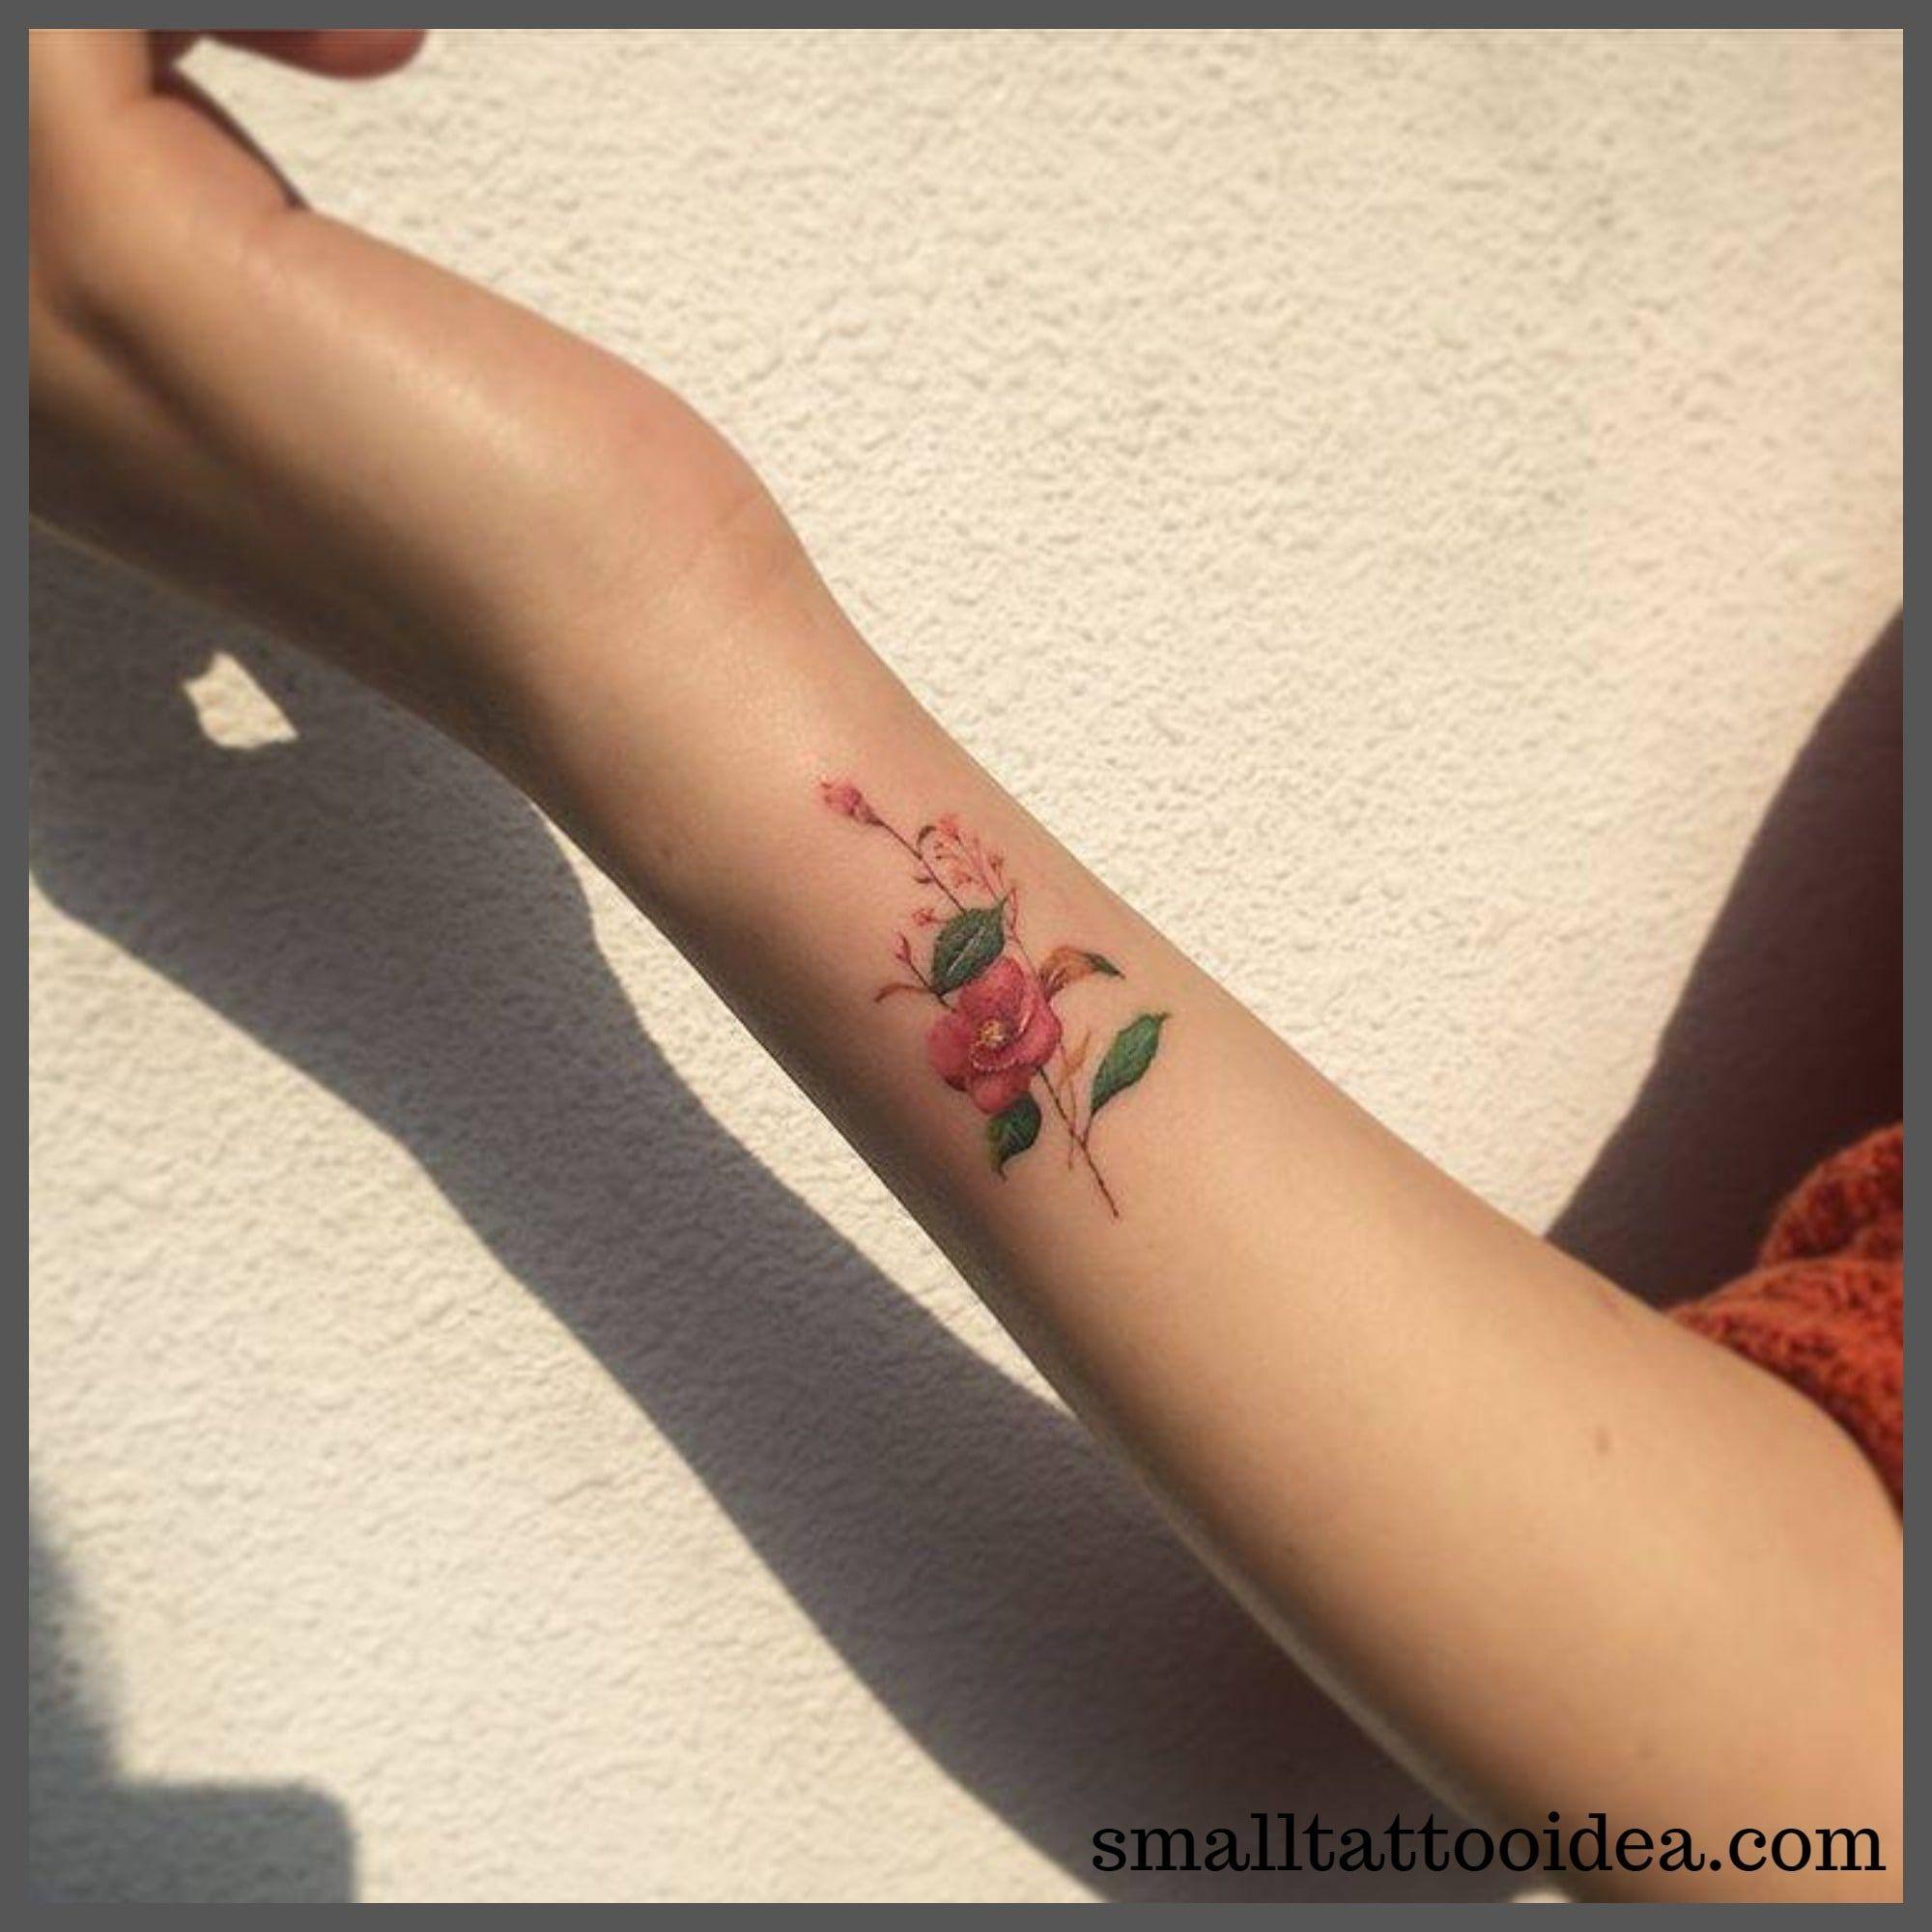 35 Small Hibiscus Tattoos Hibiscus Tattoo Hand Tattoos Flower Tattoo Hand,Simple Graphic Design Artwork